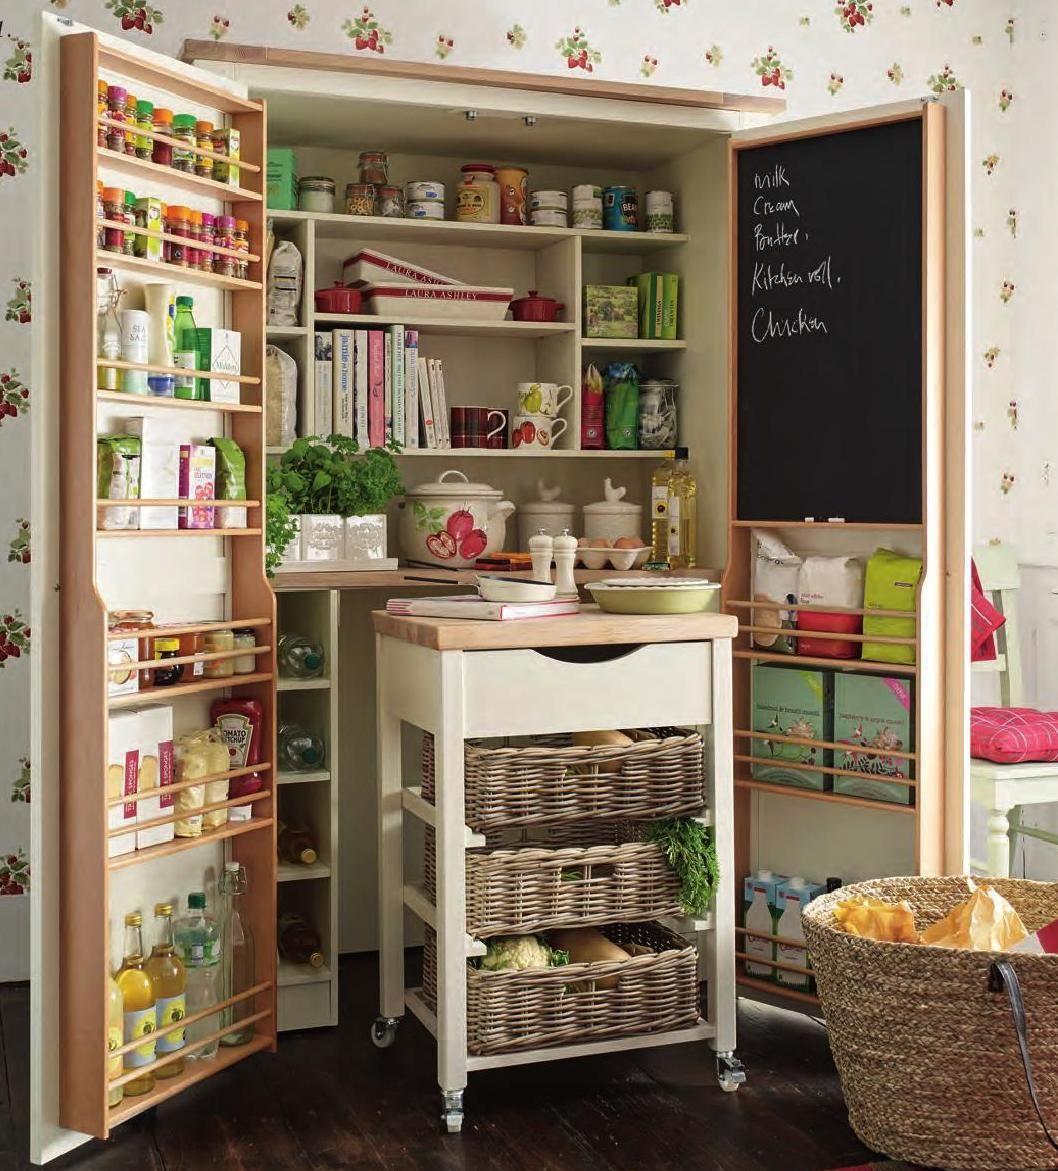 Kitchen Furniture Catalogue: Laura Ashley Spring/Summer 2016 Catalog